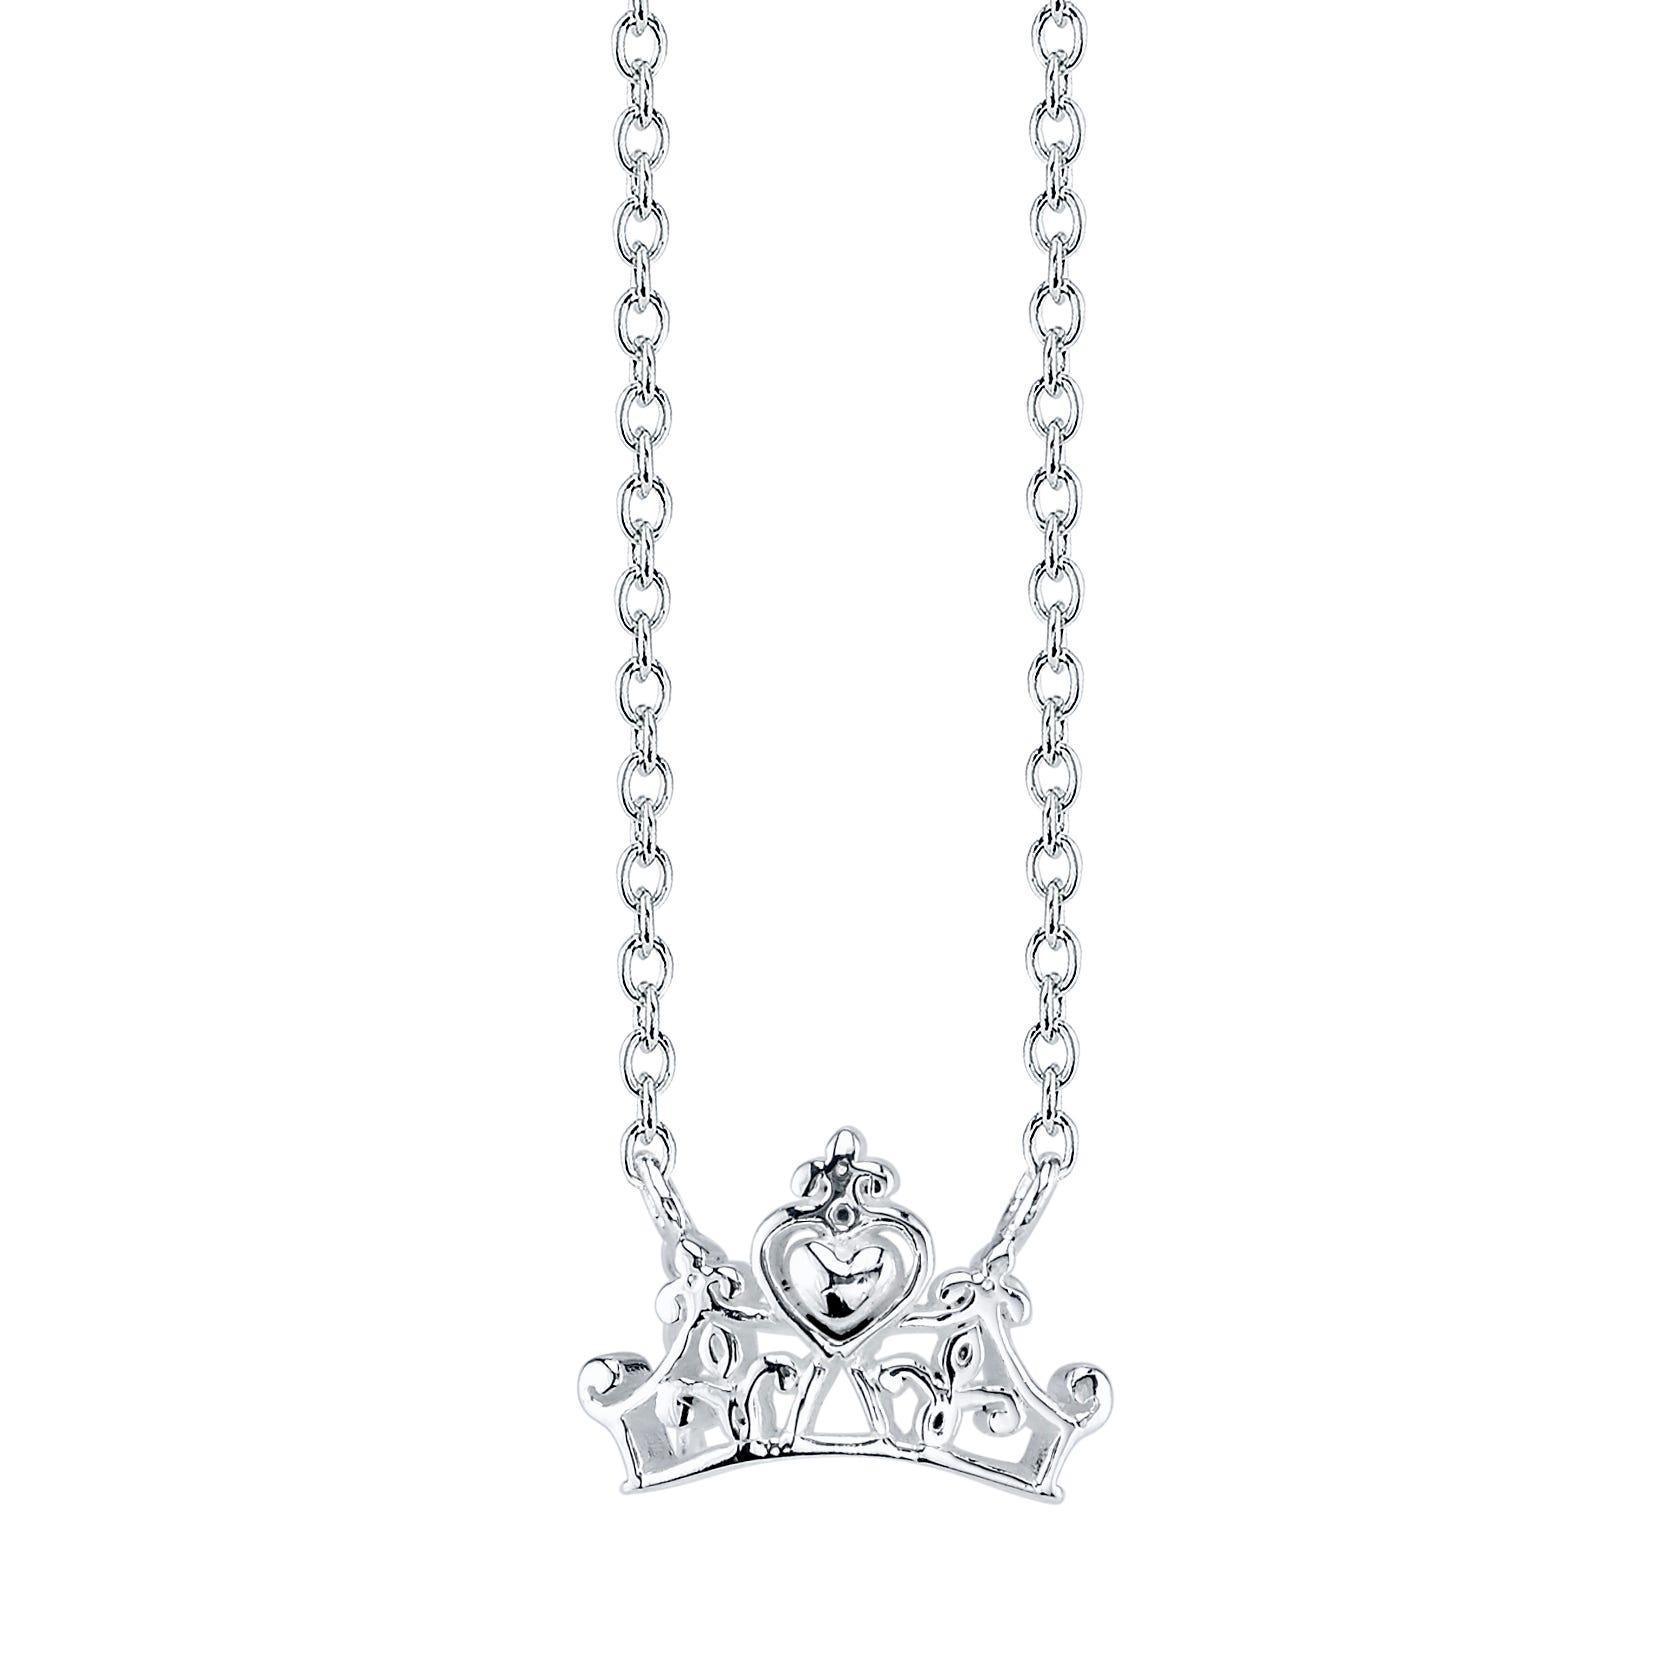 DISNEY© Princess Tiara Necklace in Sterling Silver